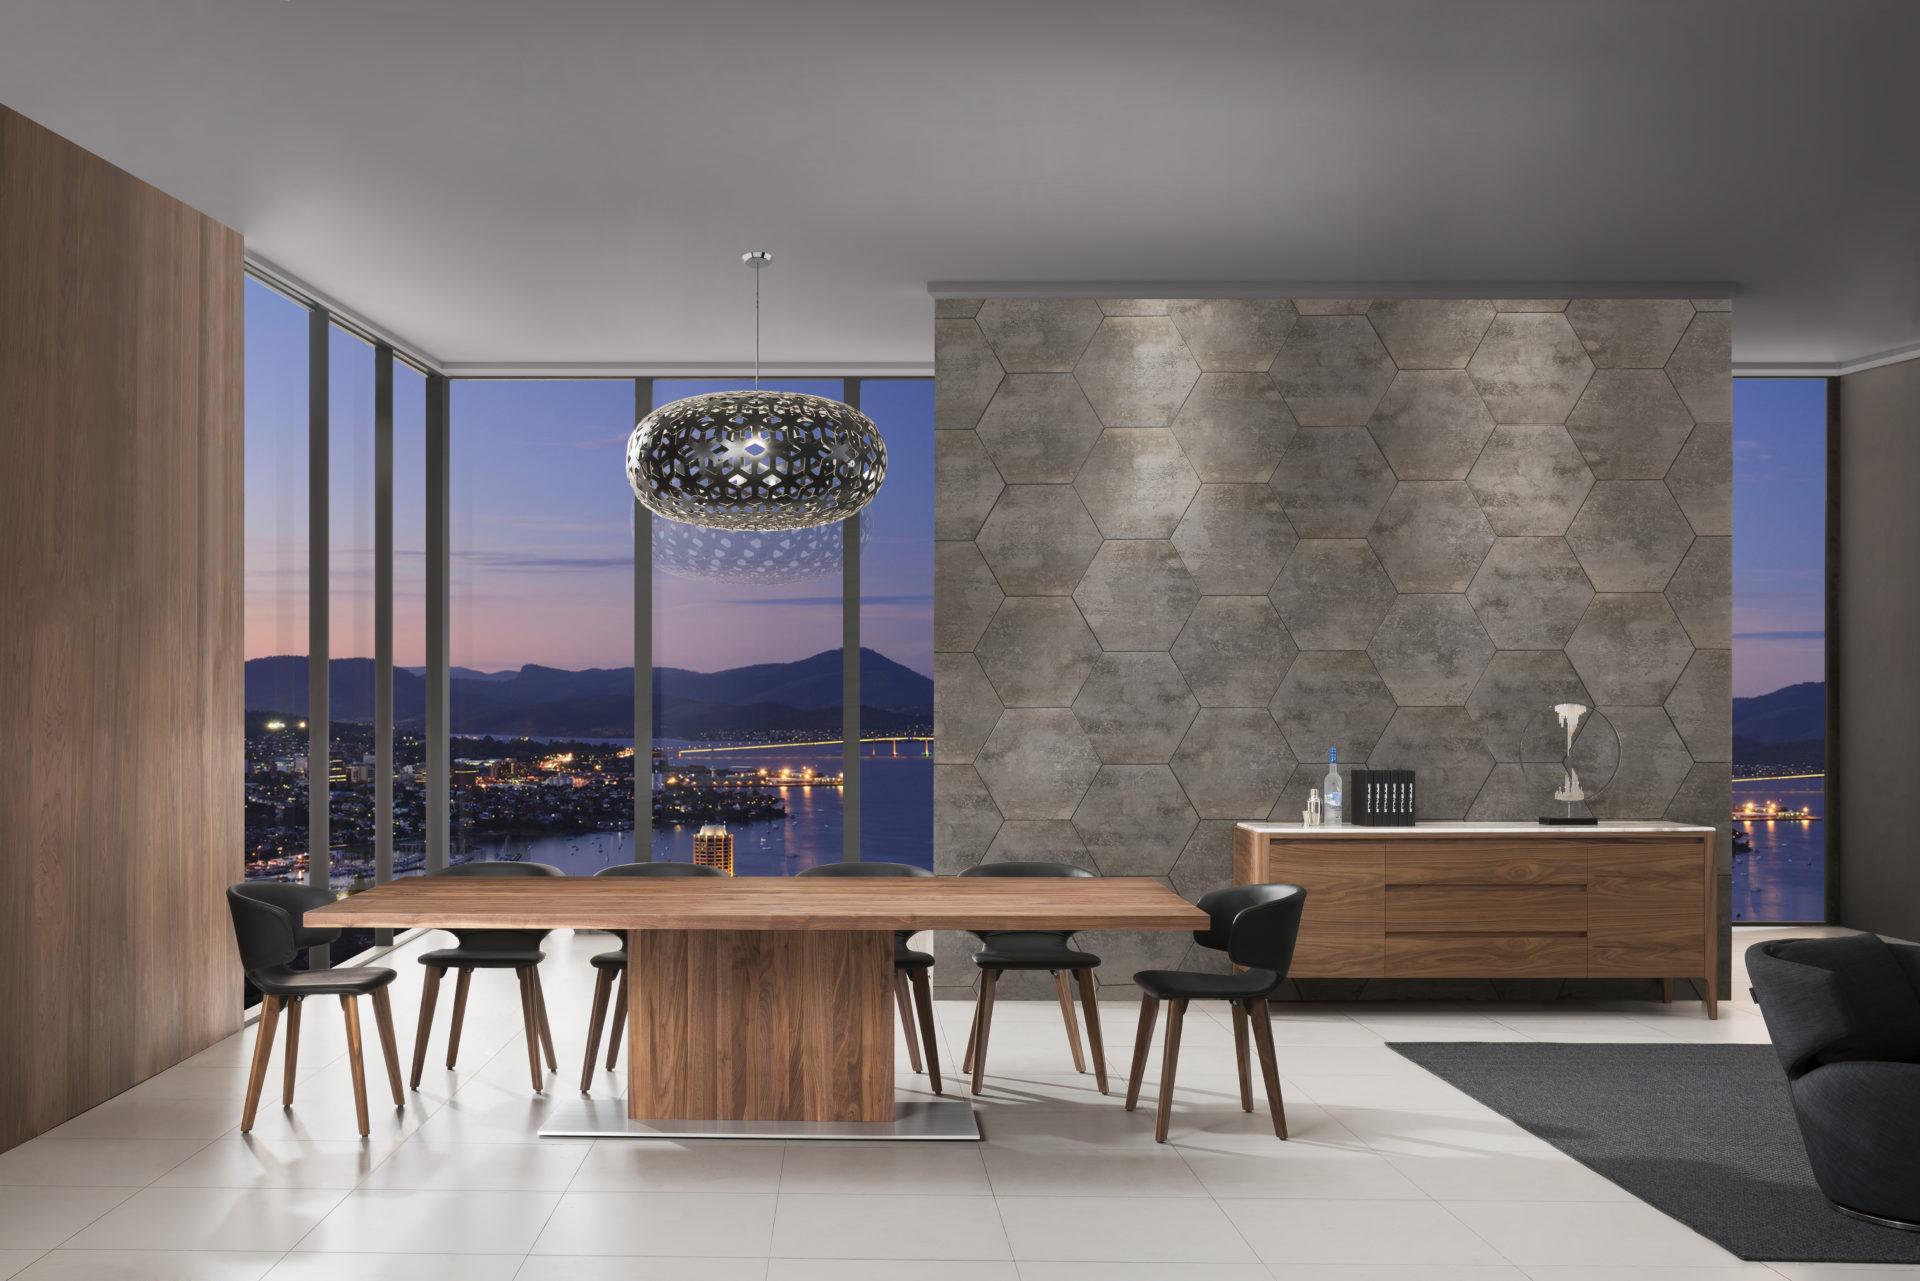 Colorado Dining Table 300 x 120cm